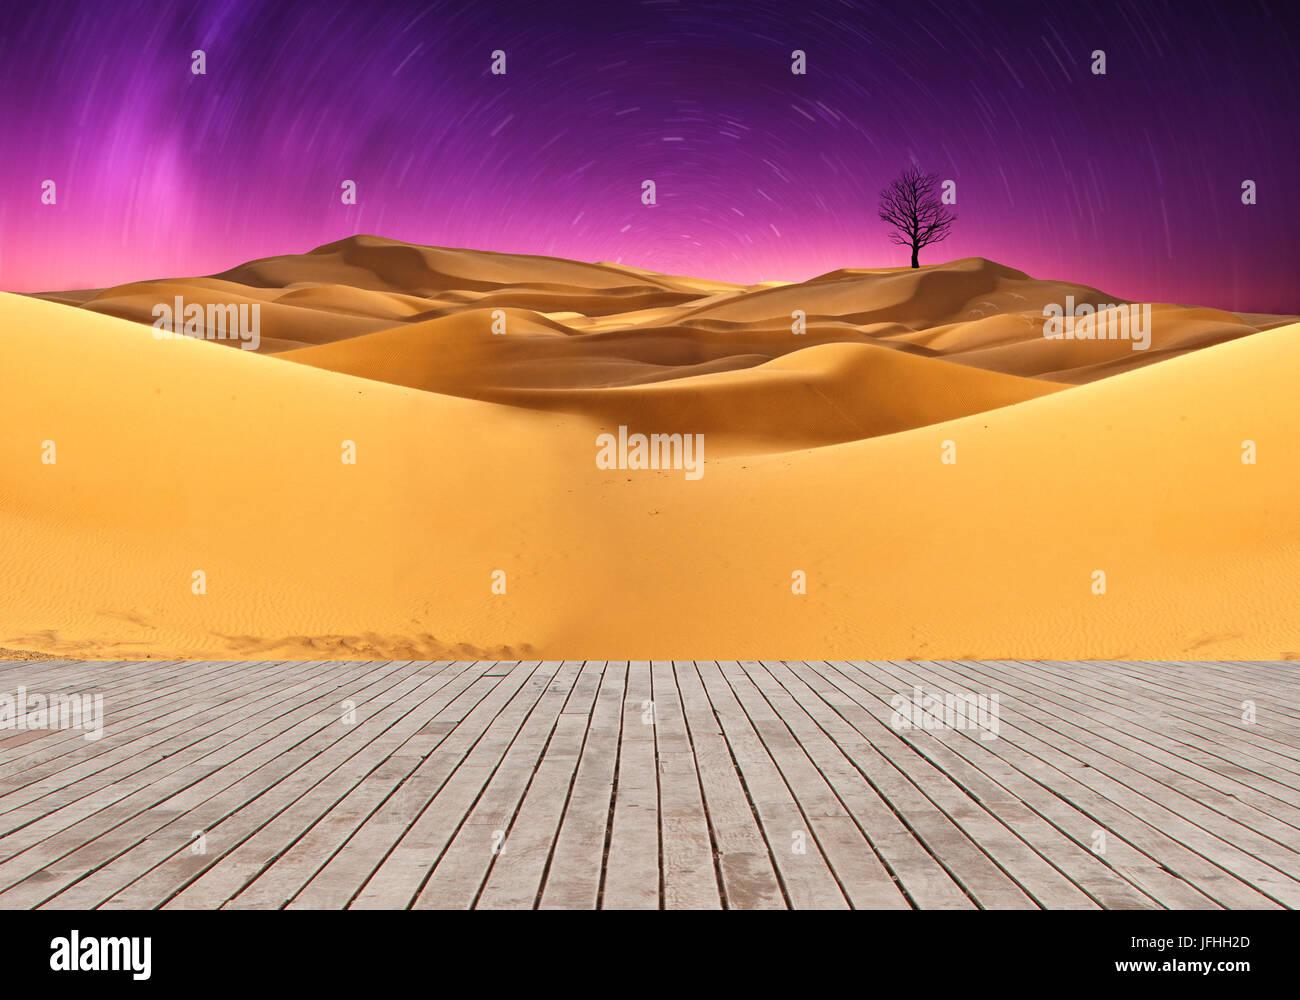 Wood plank in sahara - Stock Image